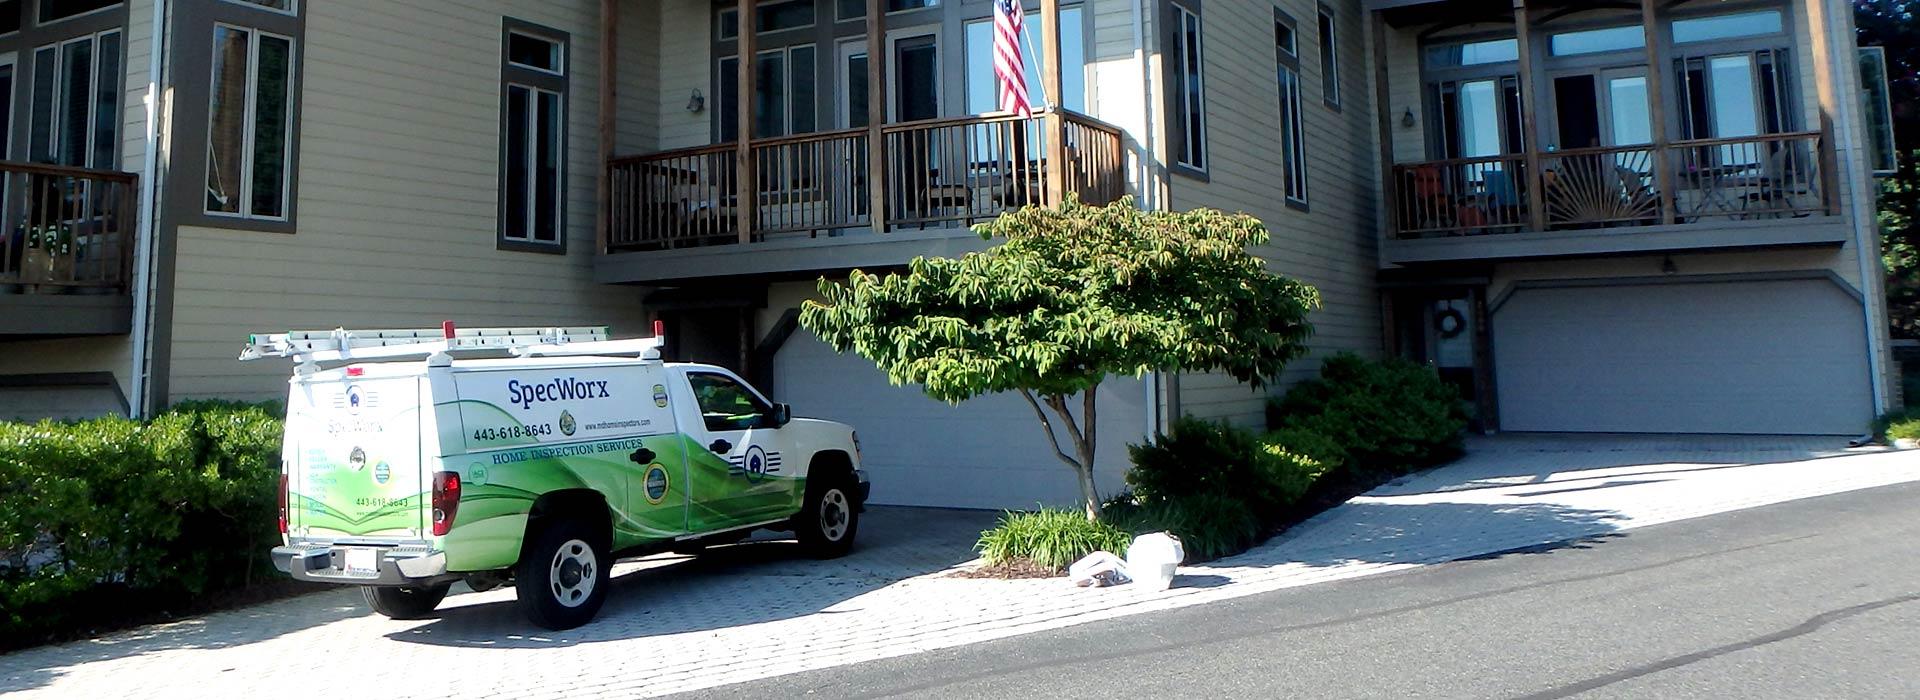 Maryland Home Inspection SPECWORX Truck